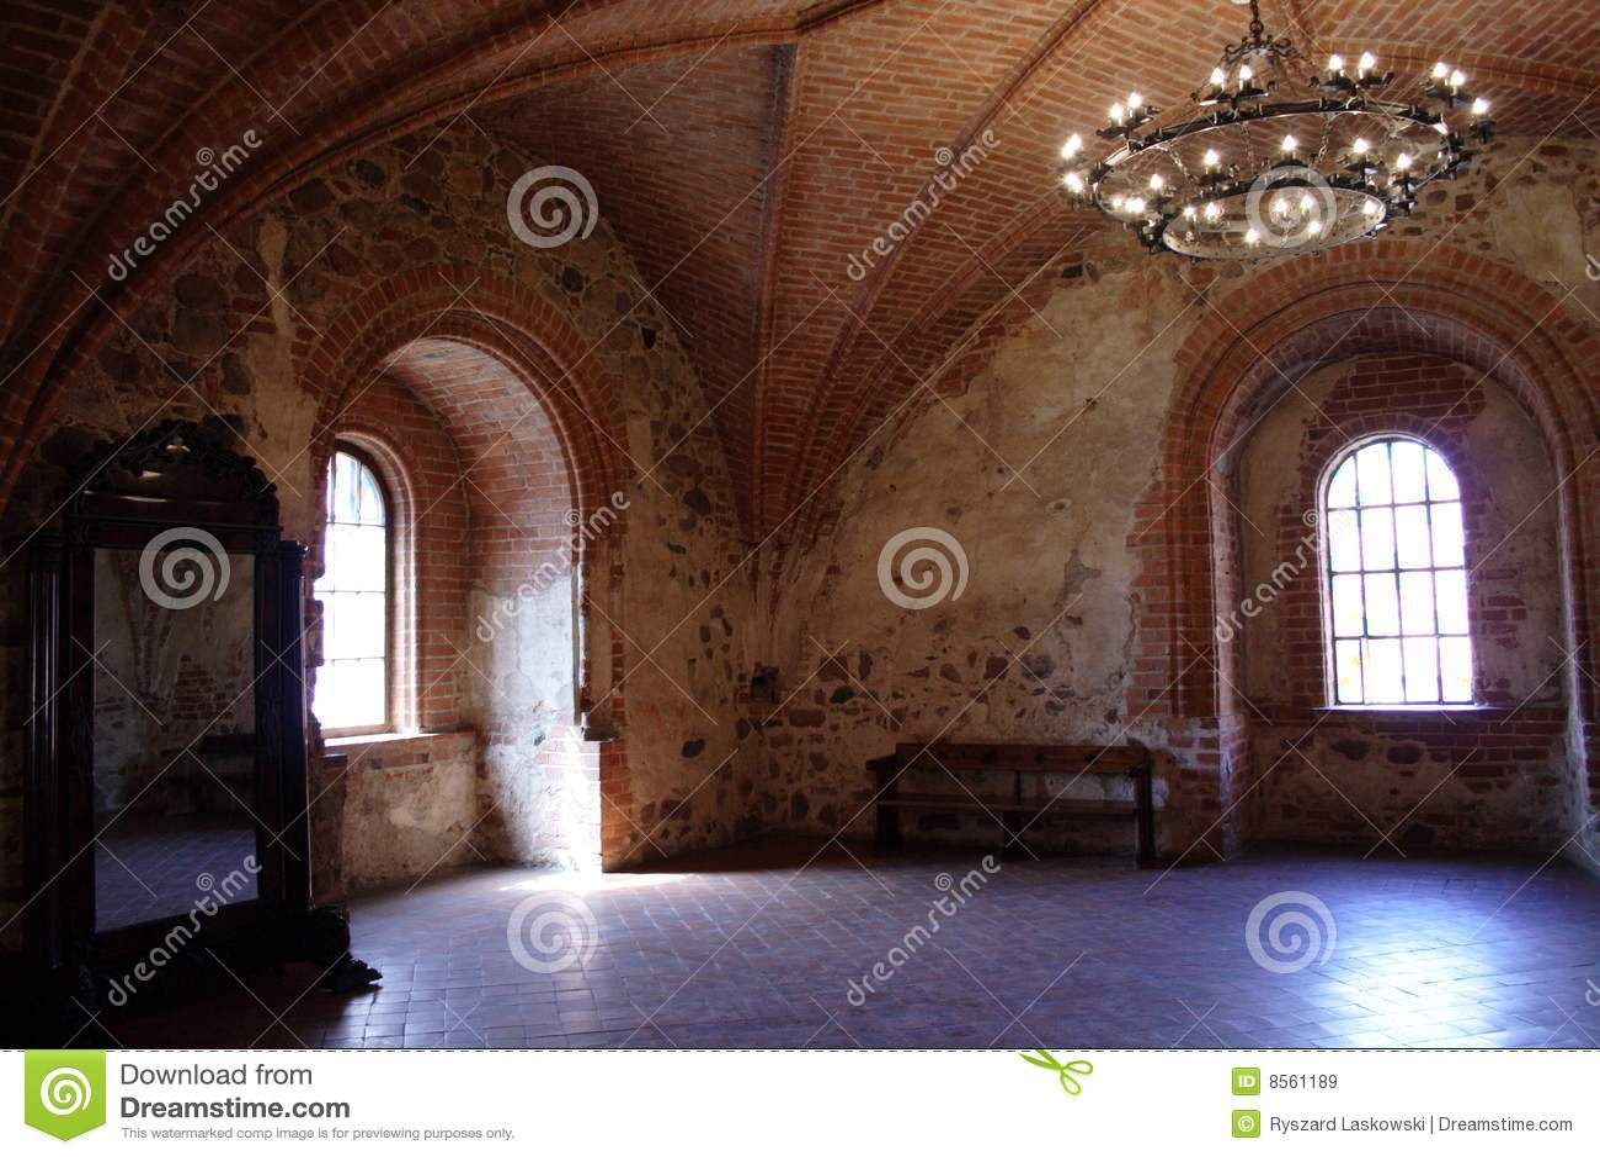 Castle chamber